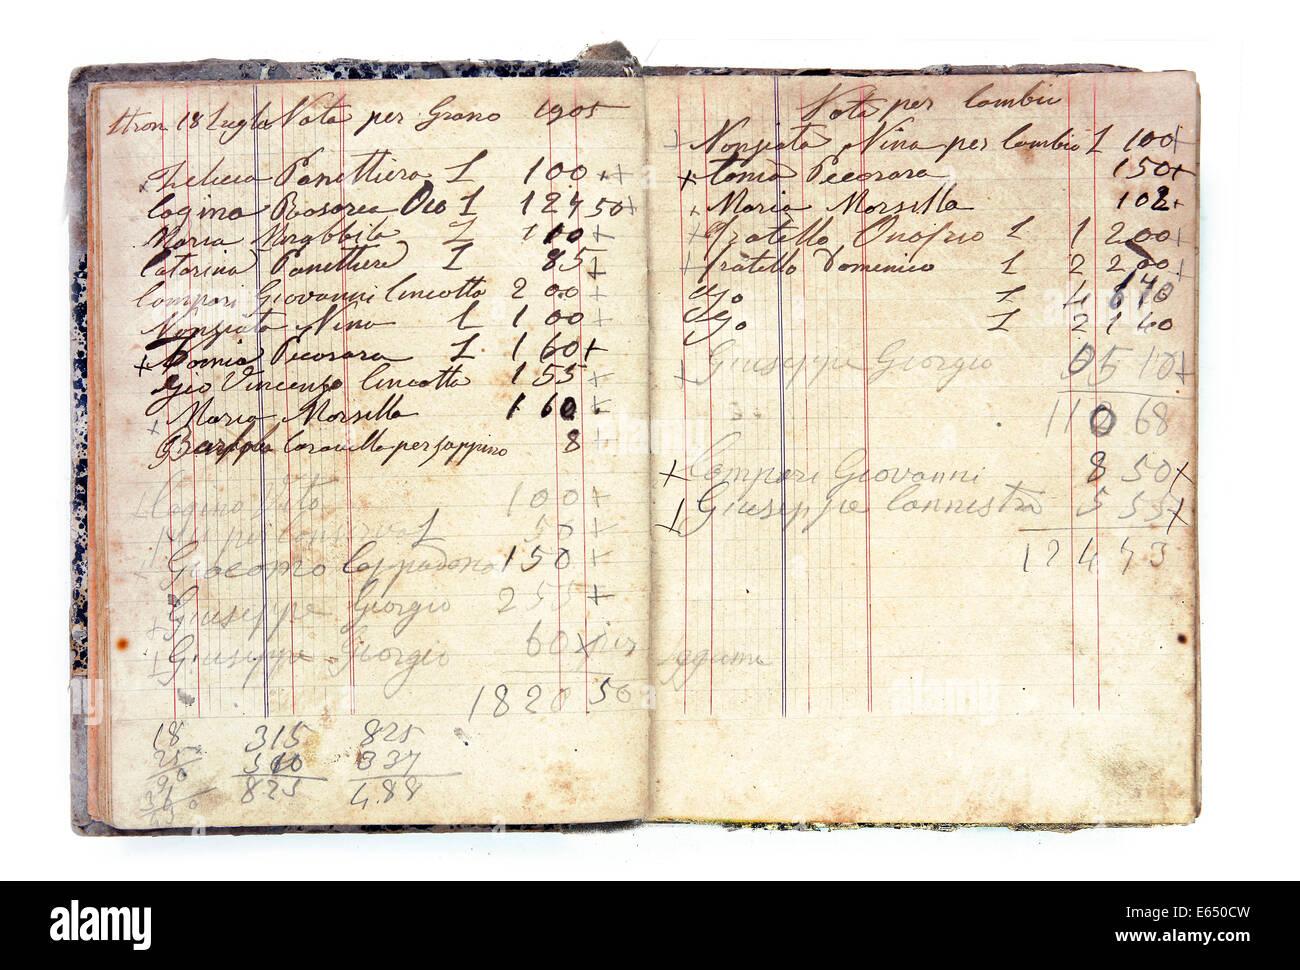 Historic debt register - Stock Image